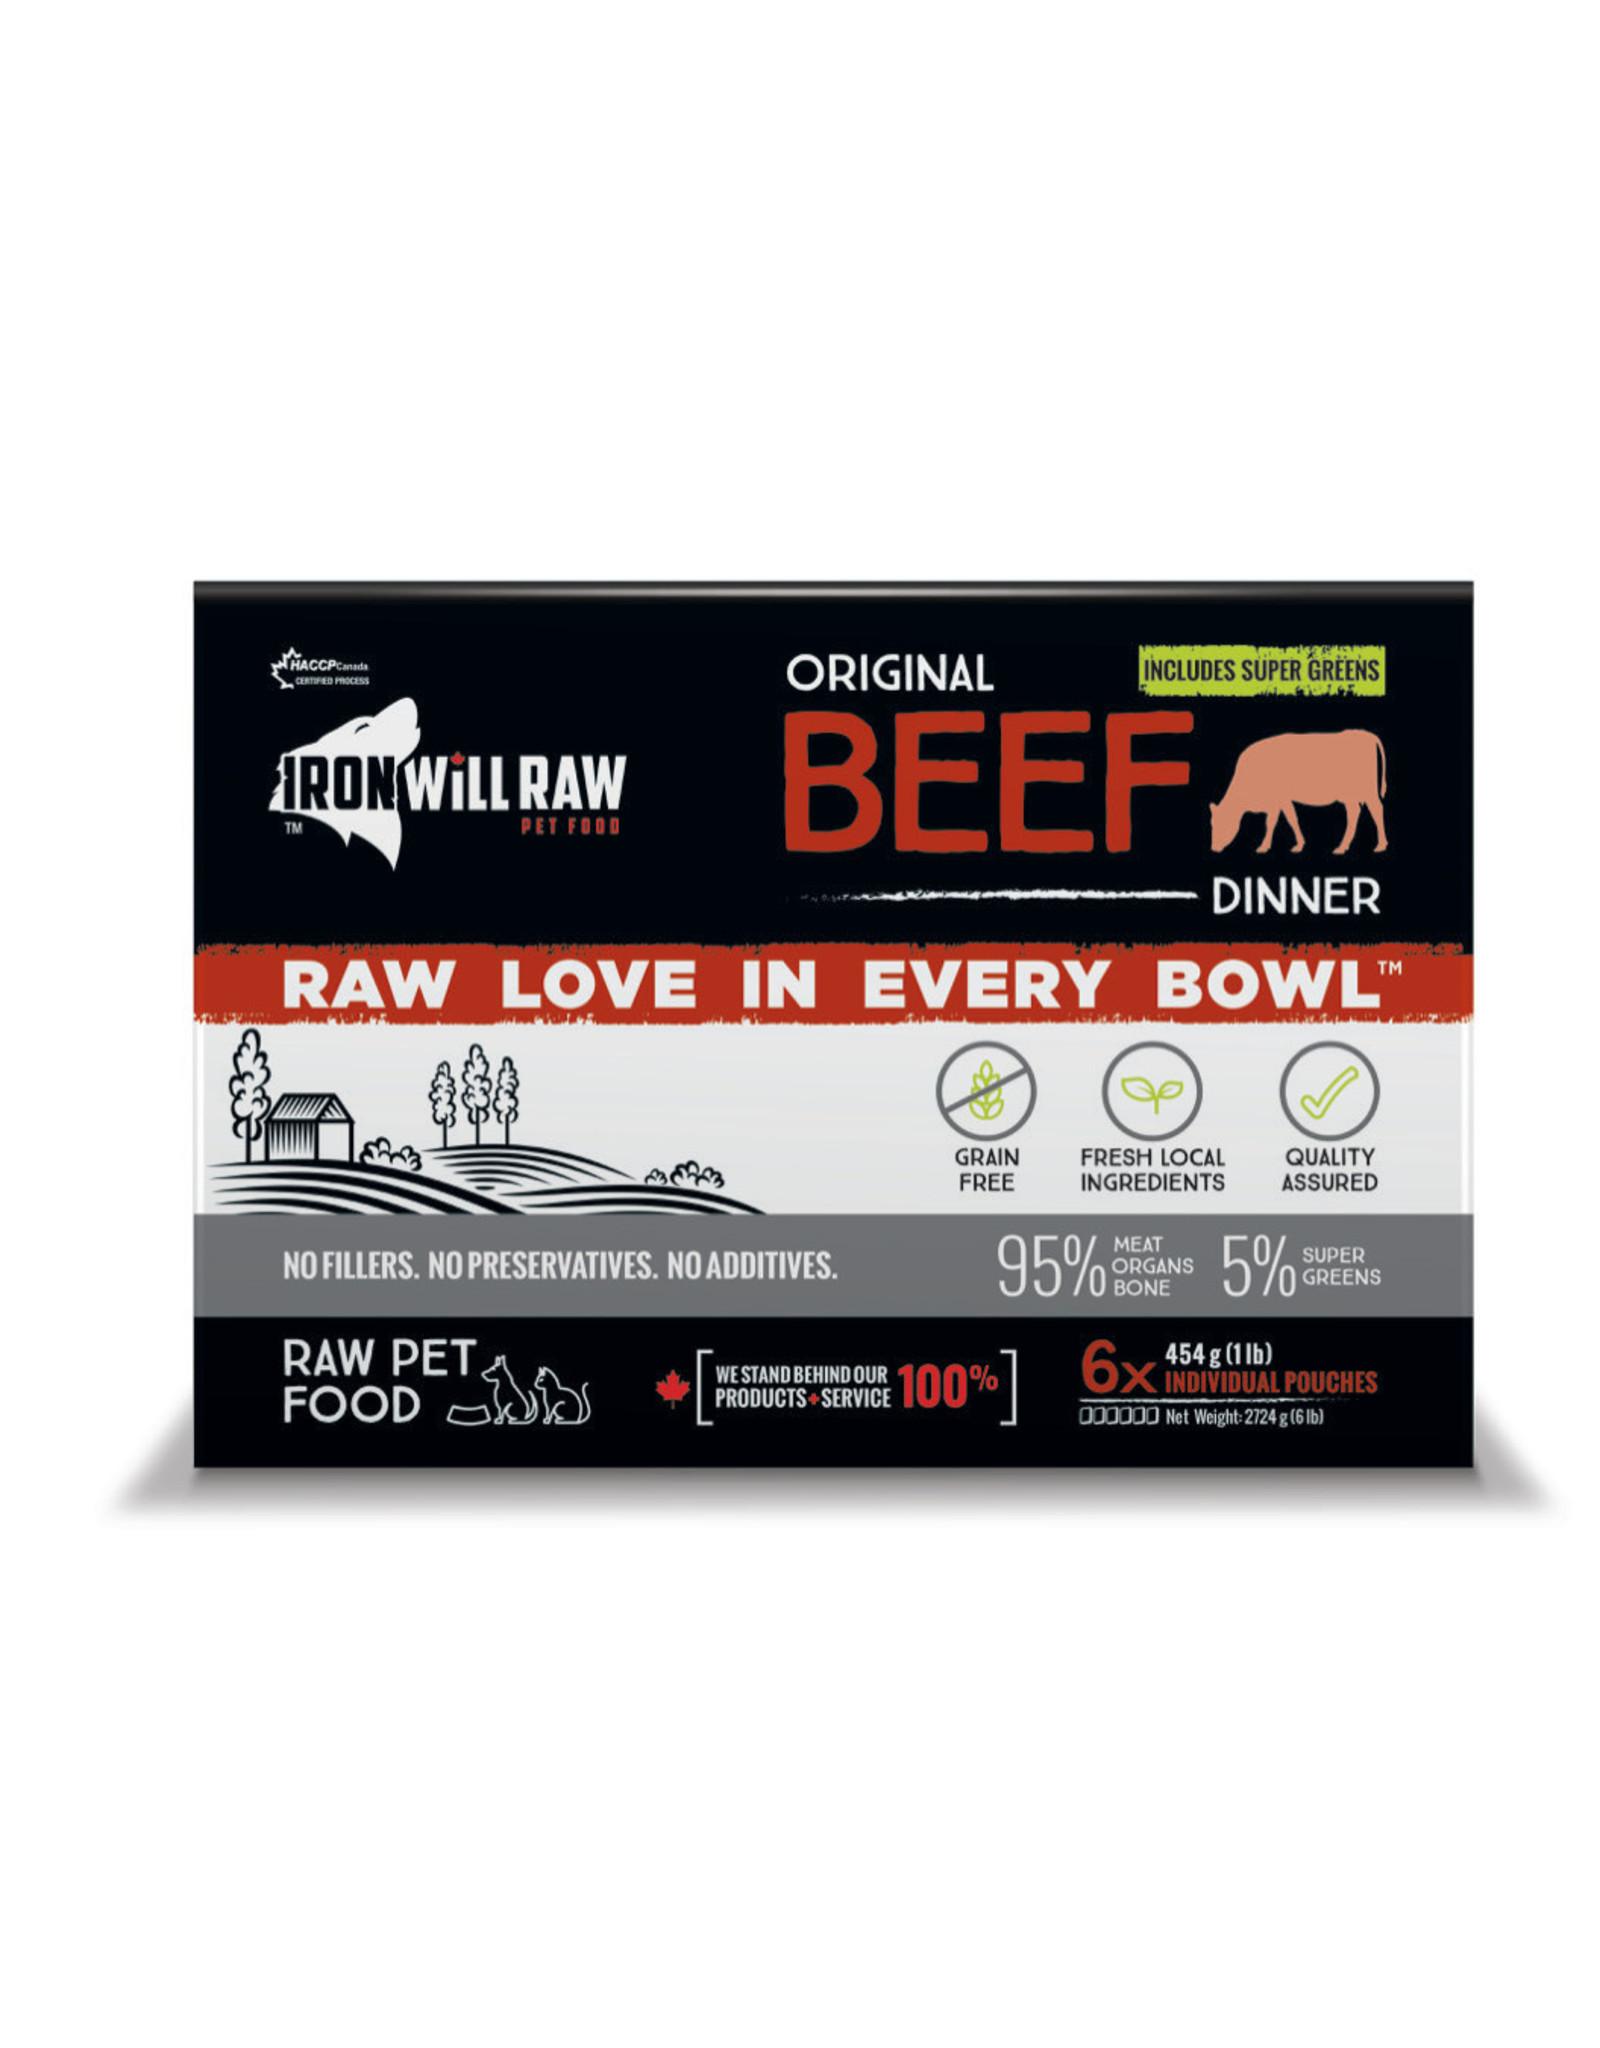 Iron Will Raw Iron Will Raw - Original Beef 6LB